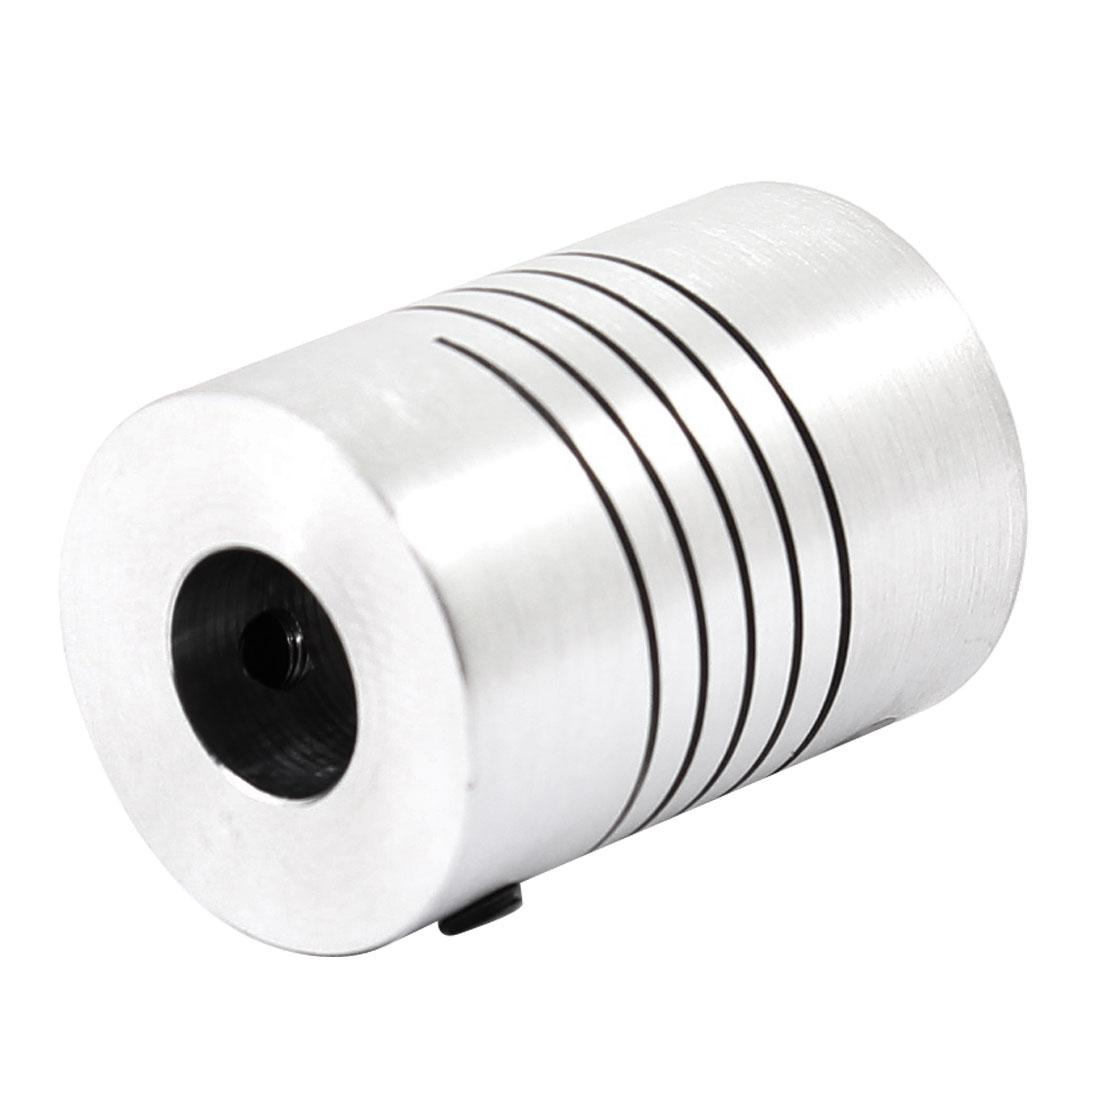 4mmx8mm D18L25 CNC Motor Helical Shaft Coupler Beam Coupling Connect Encoder